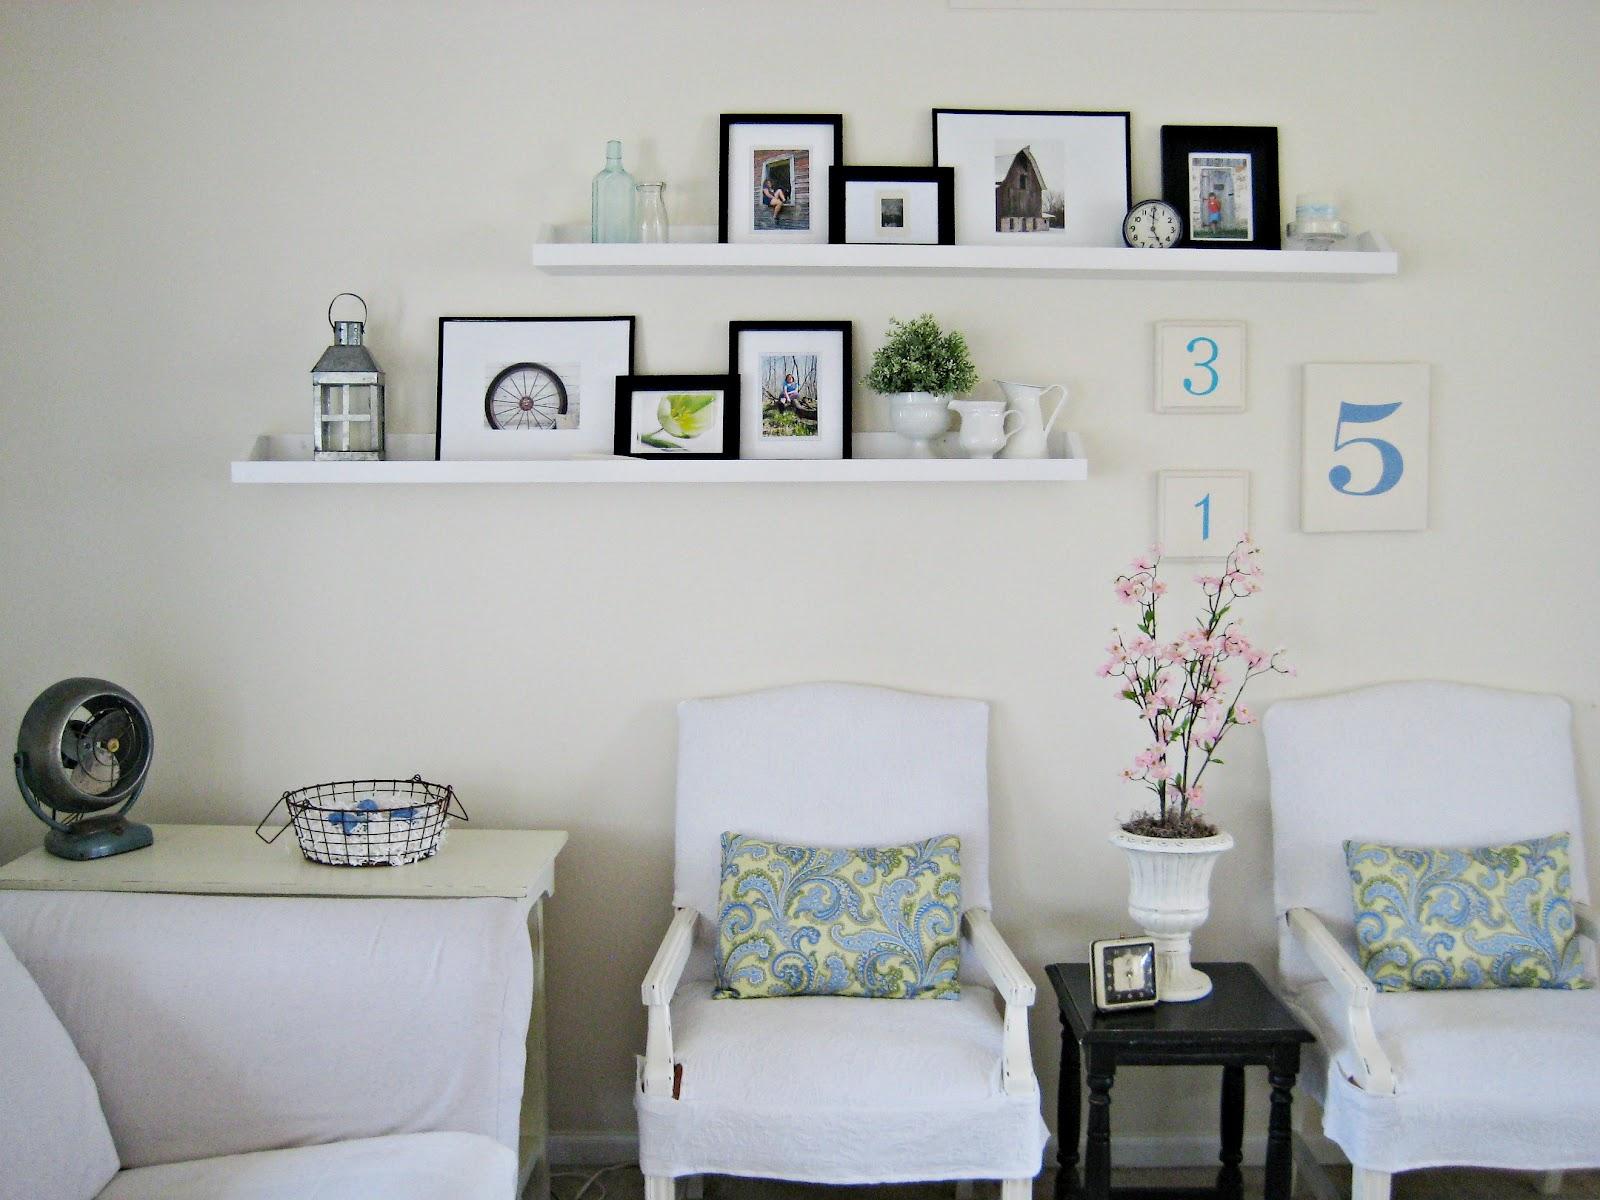 Happy at home diy photo ledge - Living room shelf ideas ...